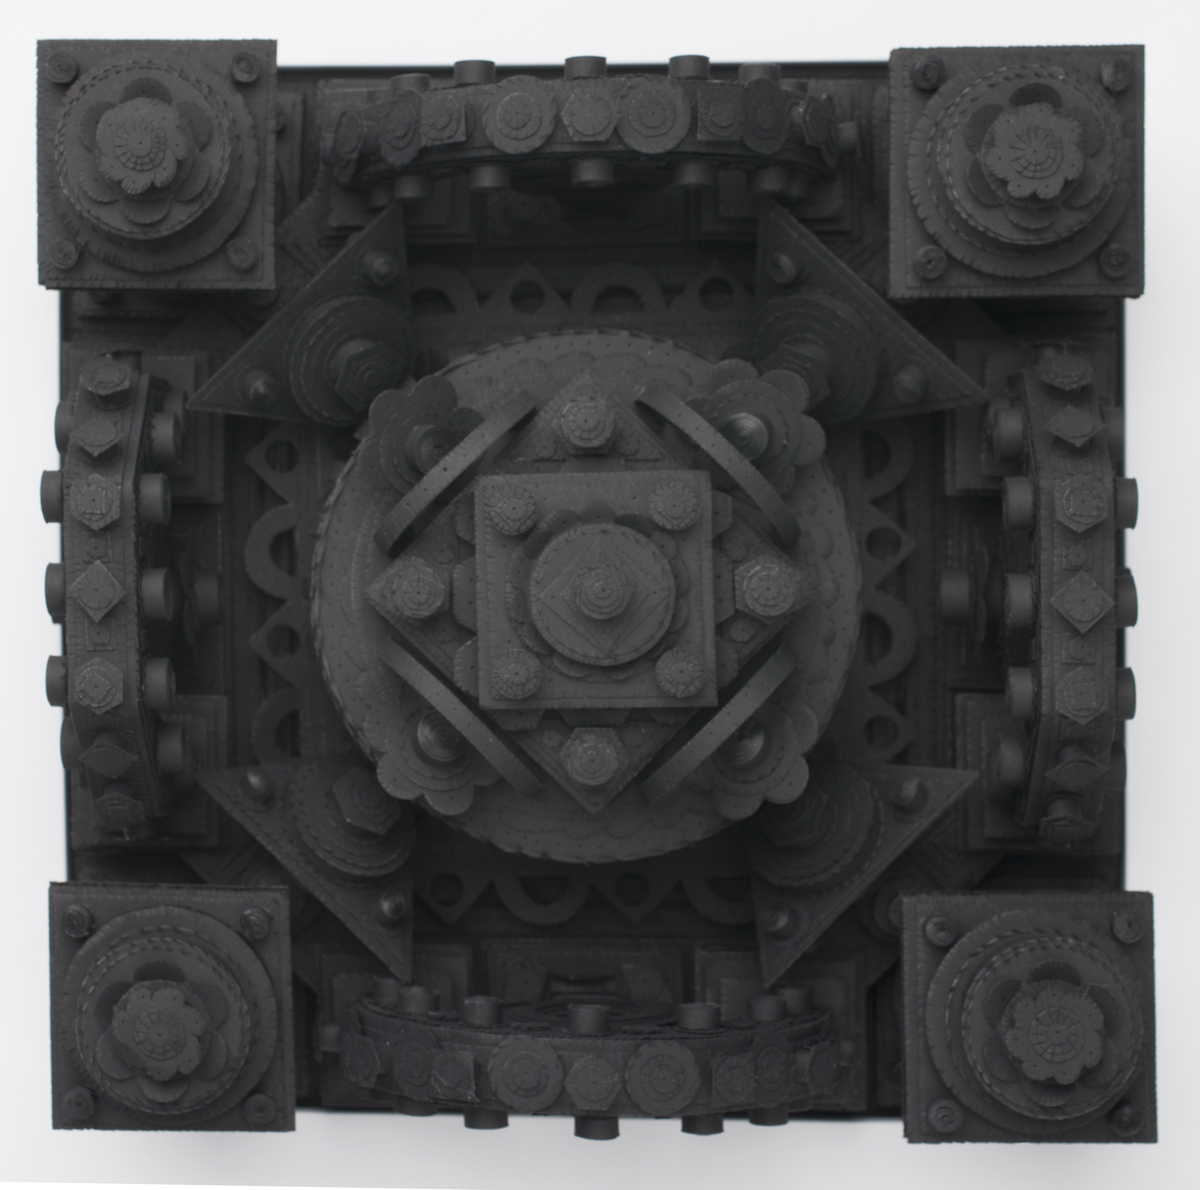 Michael Velliquette Creates Three-Dimensional Monochrome Mandalas from Cut Paper